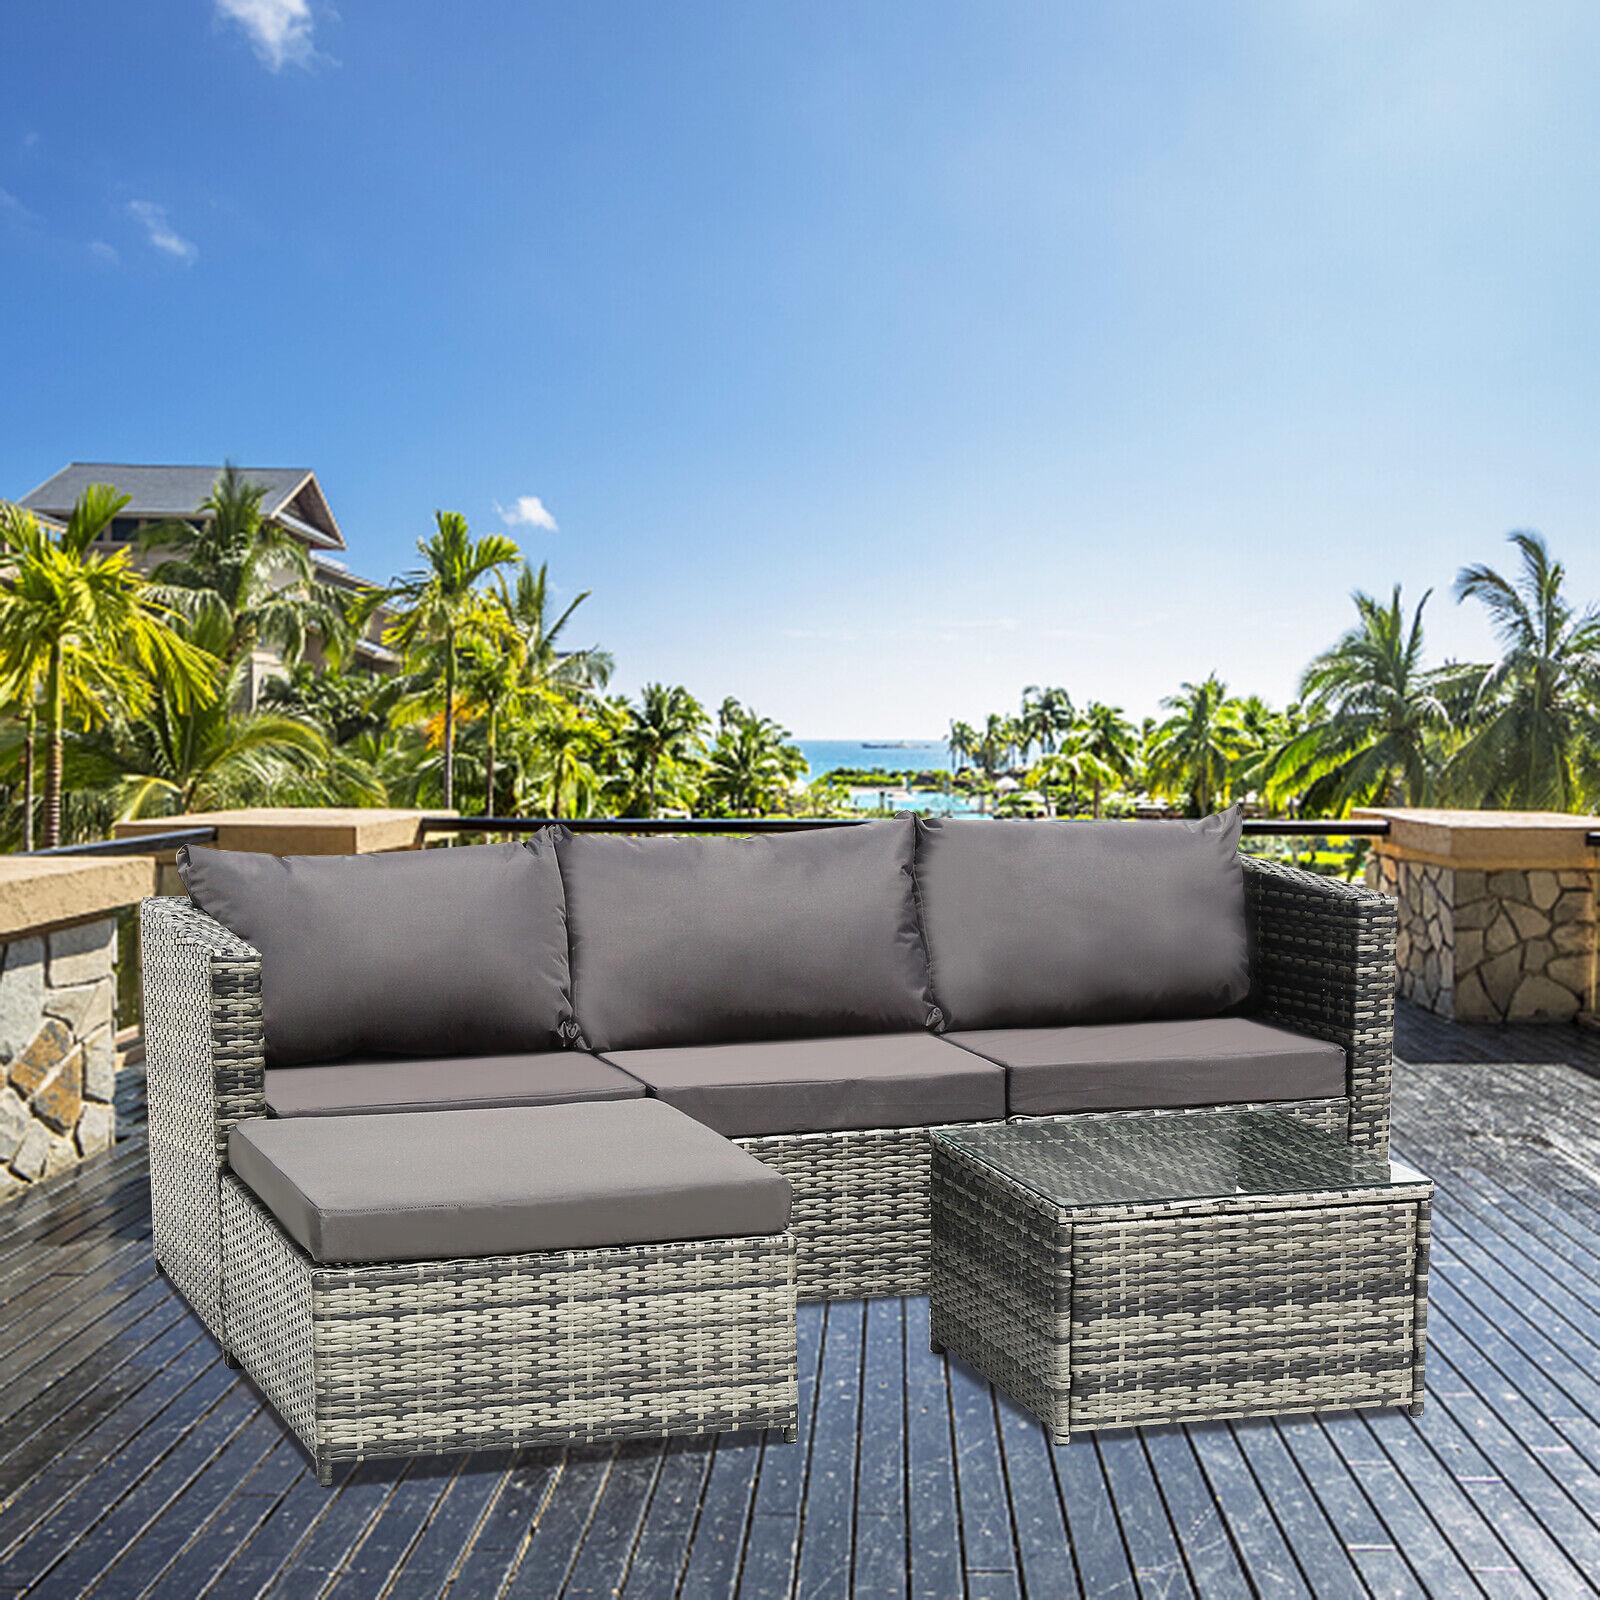 Garden Furniture - RATTAN GARDEN FURNITURE CORNER SOFA SET LOUNGER TABLE PATIO OUTDOOR CONSERVATORY